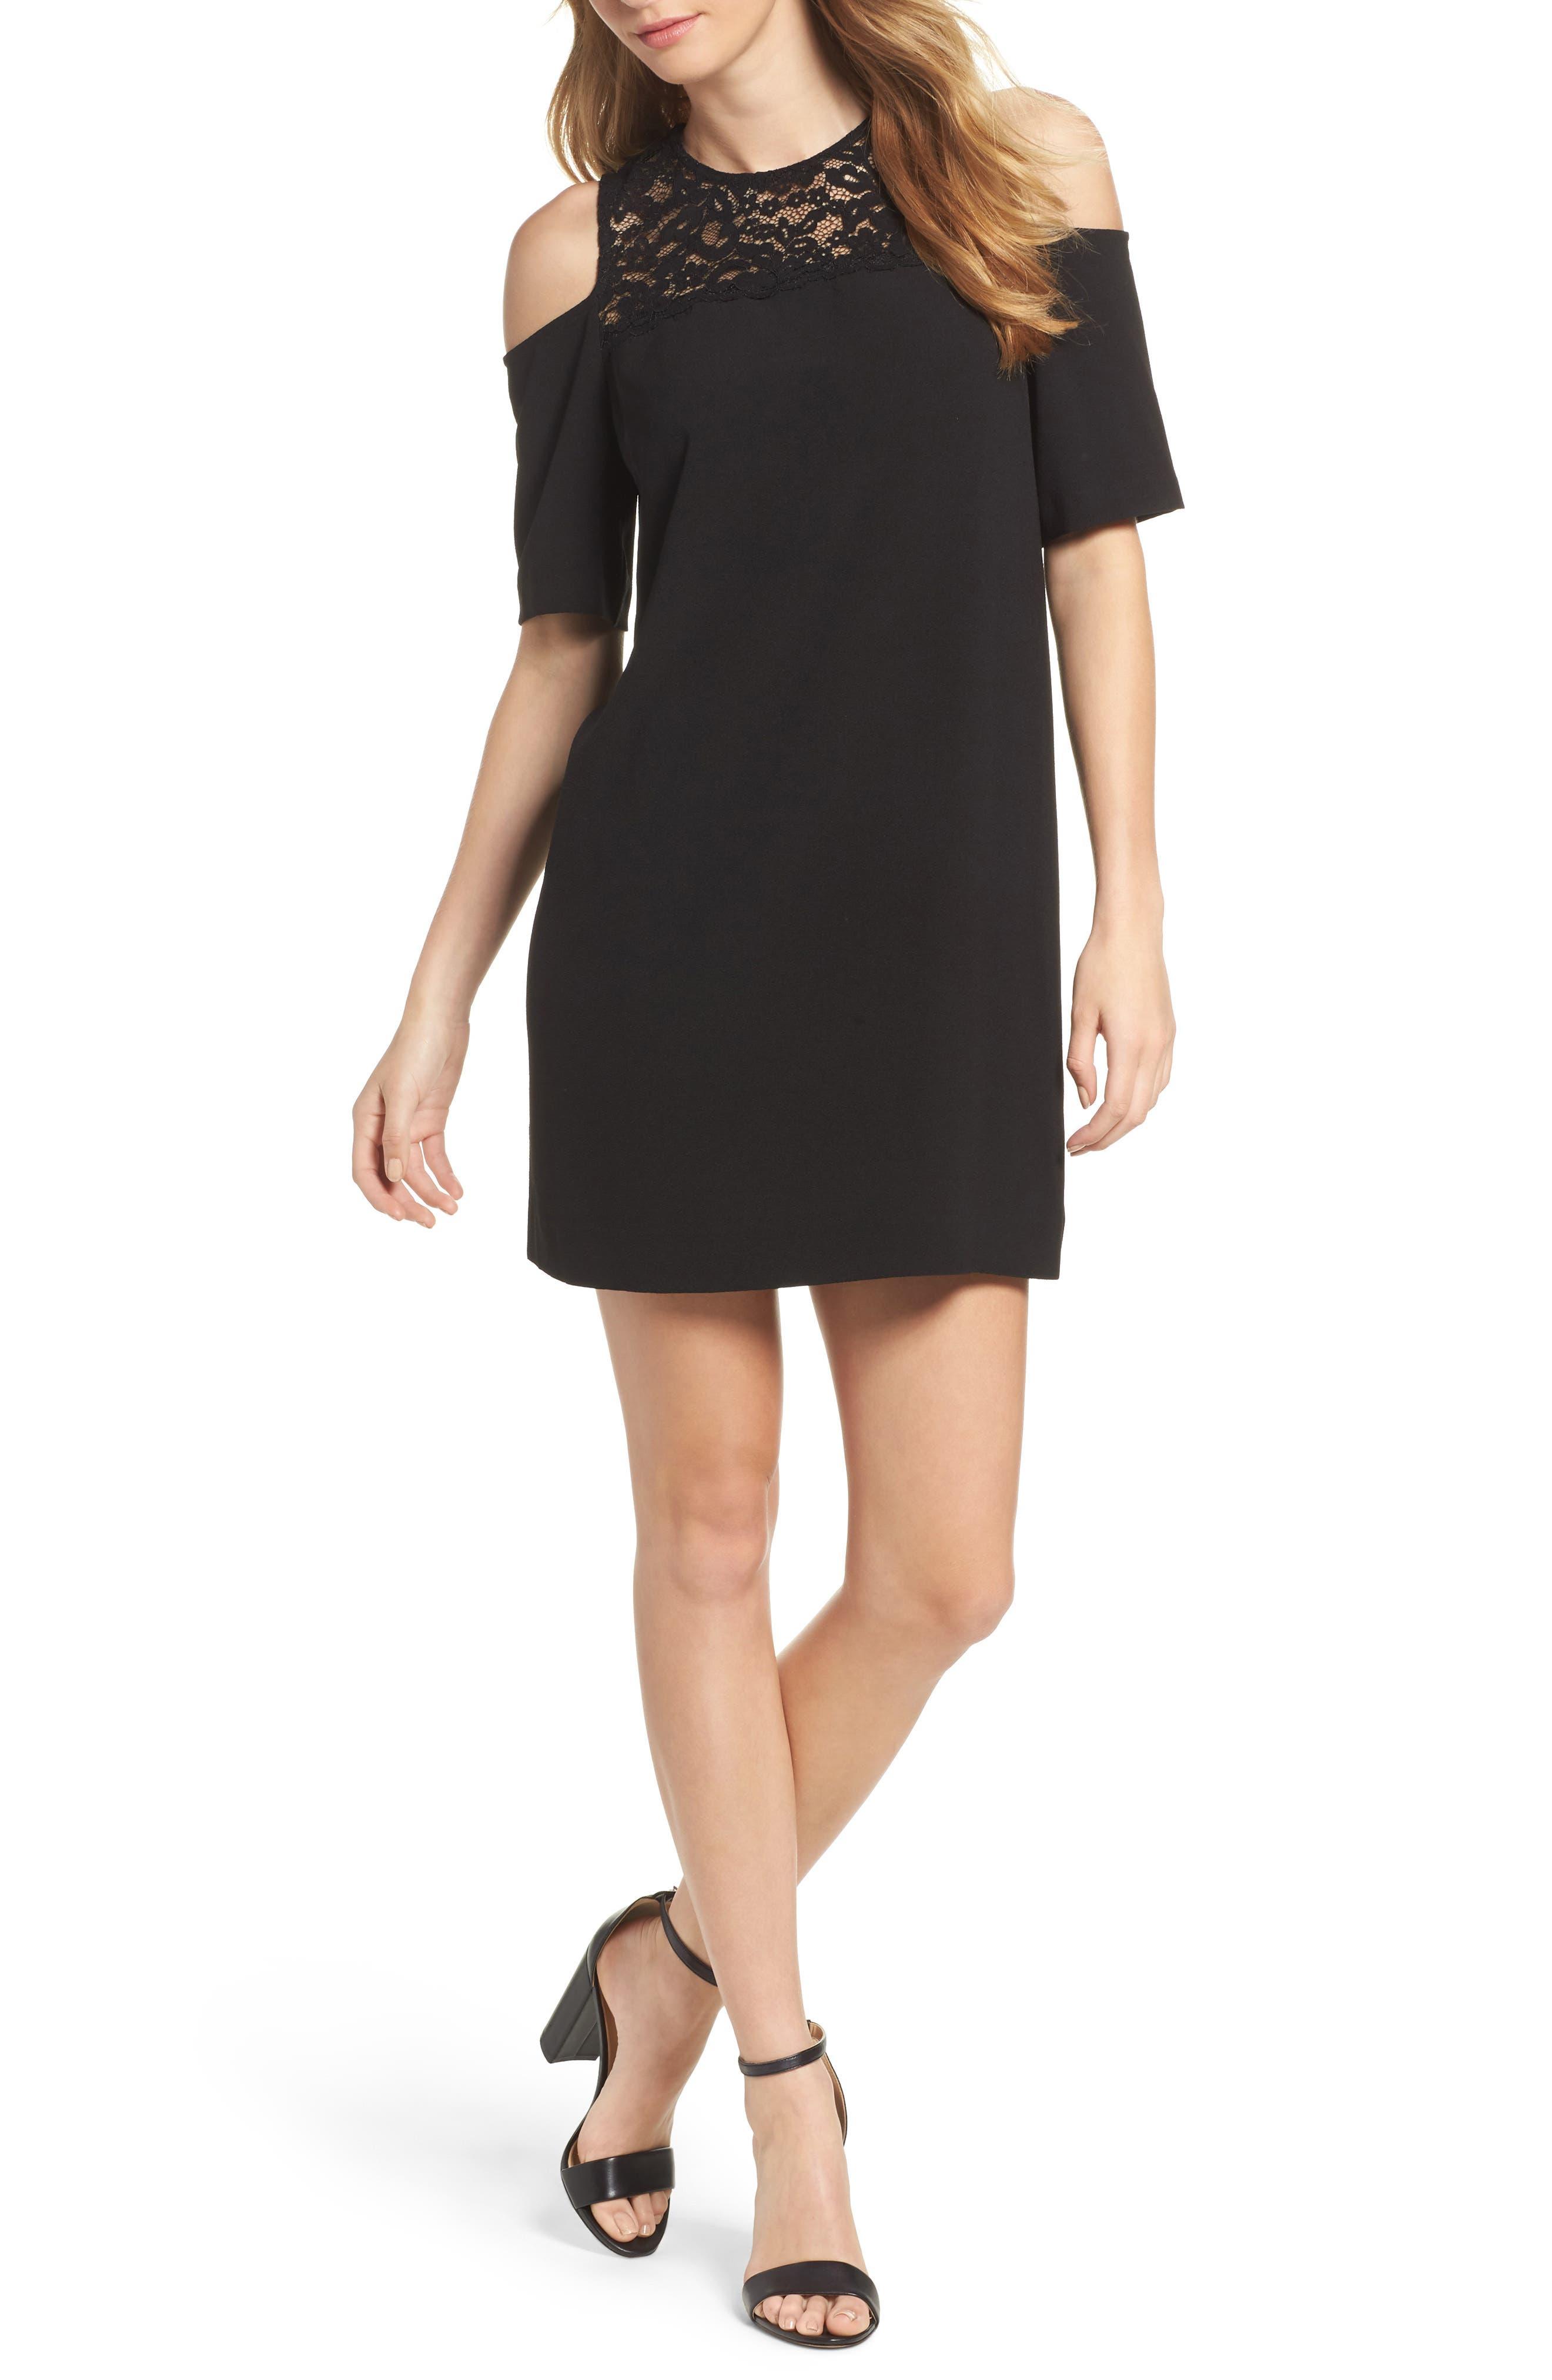 Felicity & Coco Cold Shoulder Lace Dress